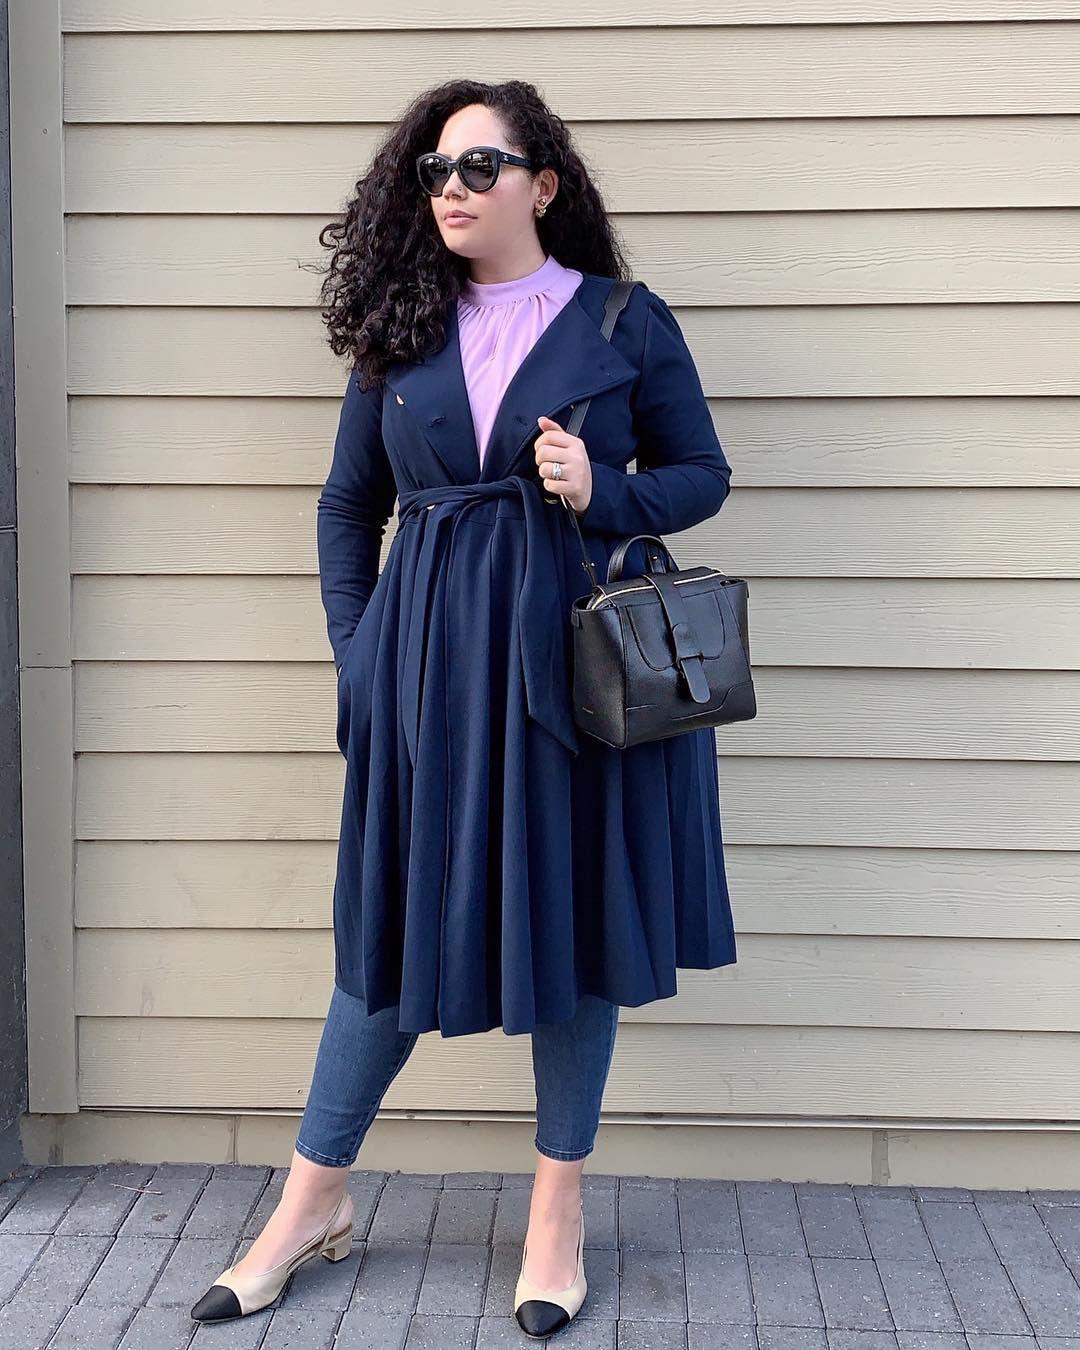 Plus size fashion for women plus size fashion pinterest